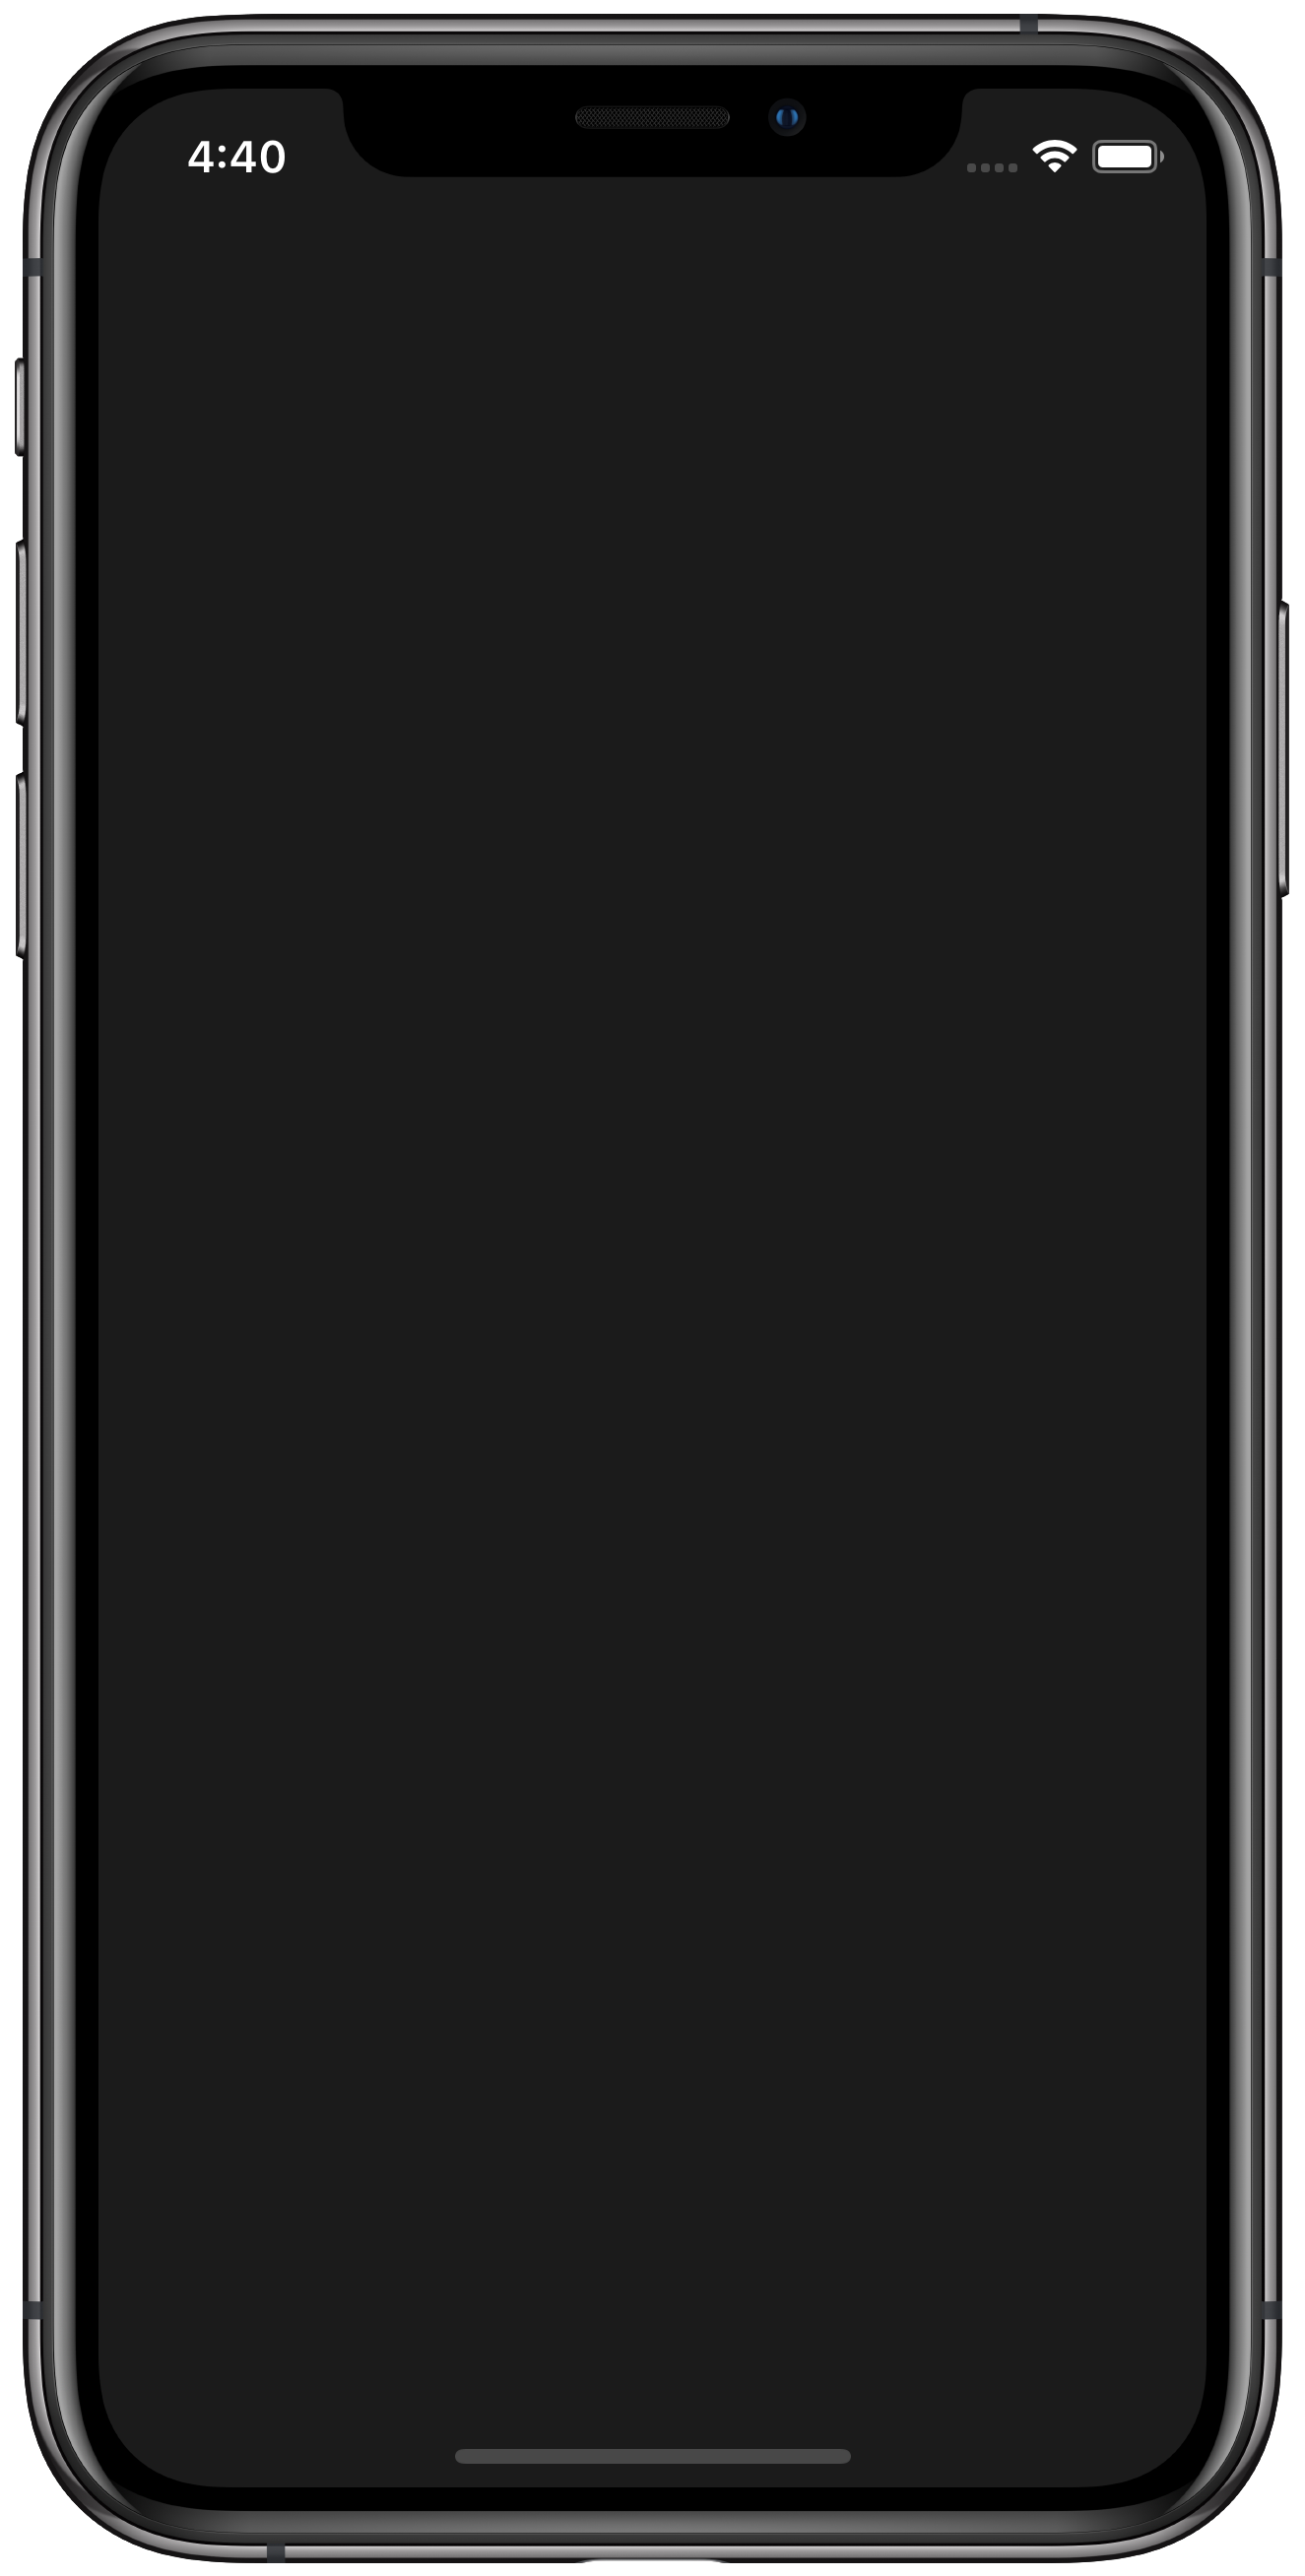 Dark iPhone app with light status bar